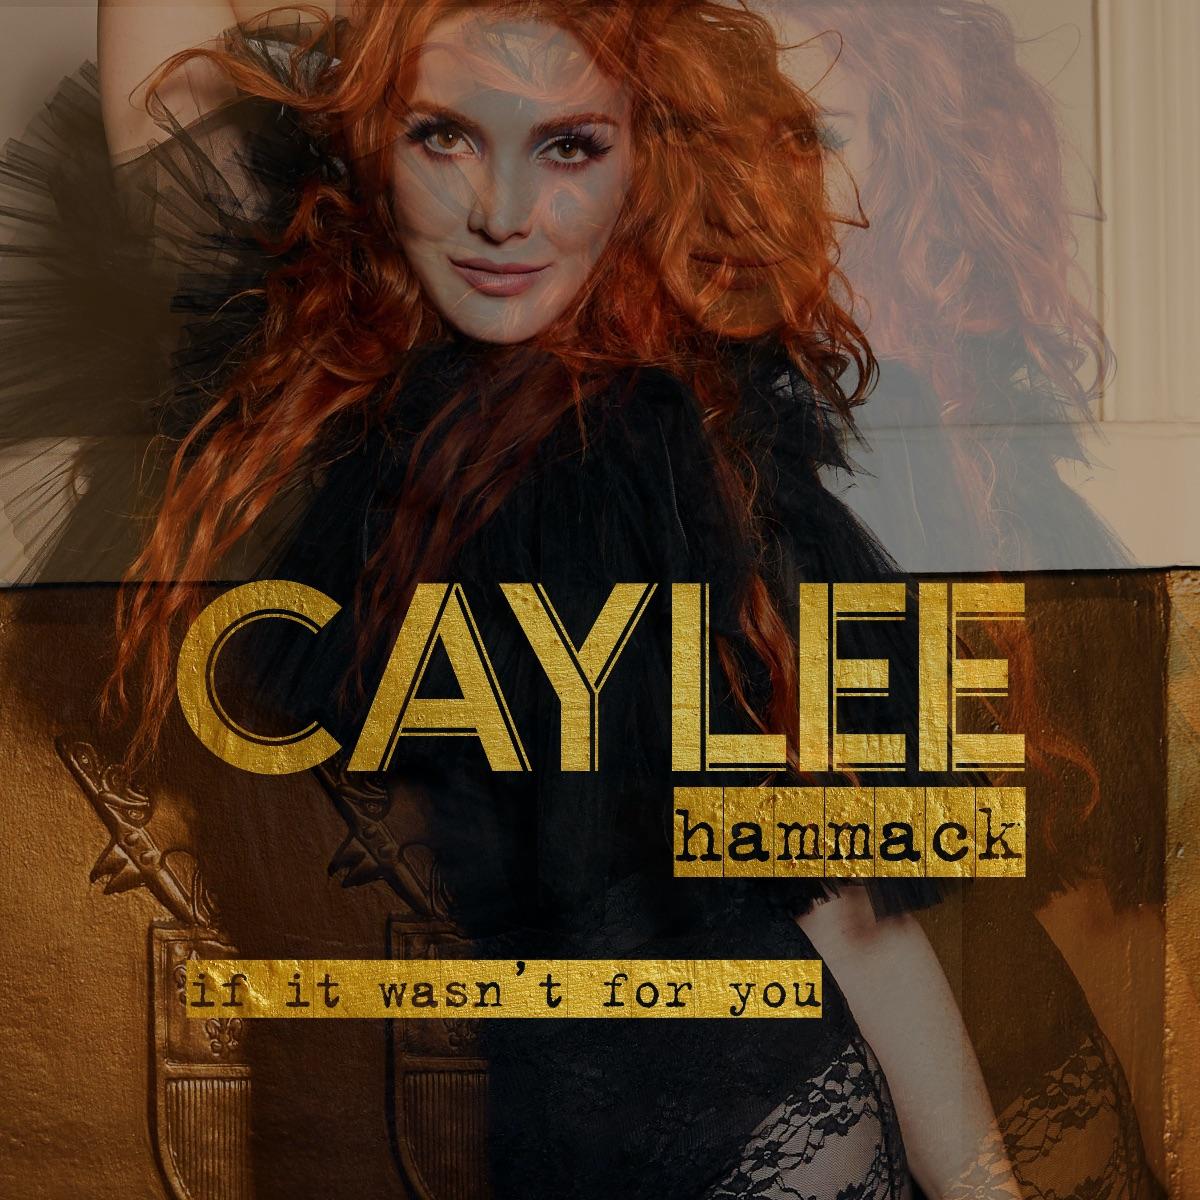 caylee-hammack-if-it